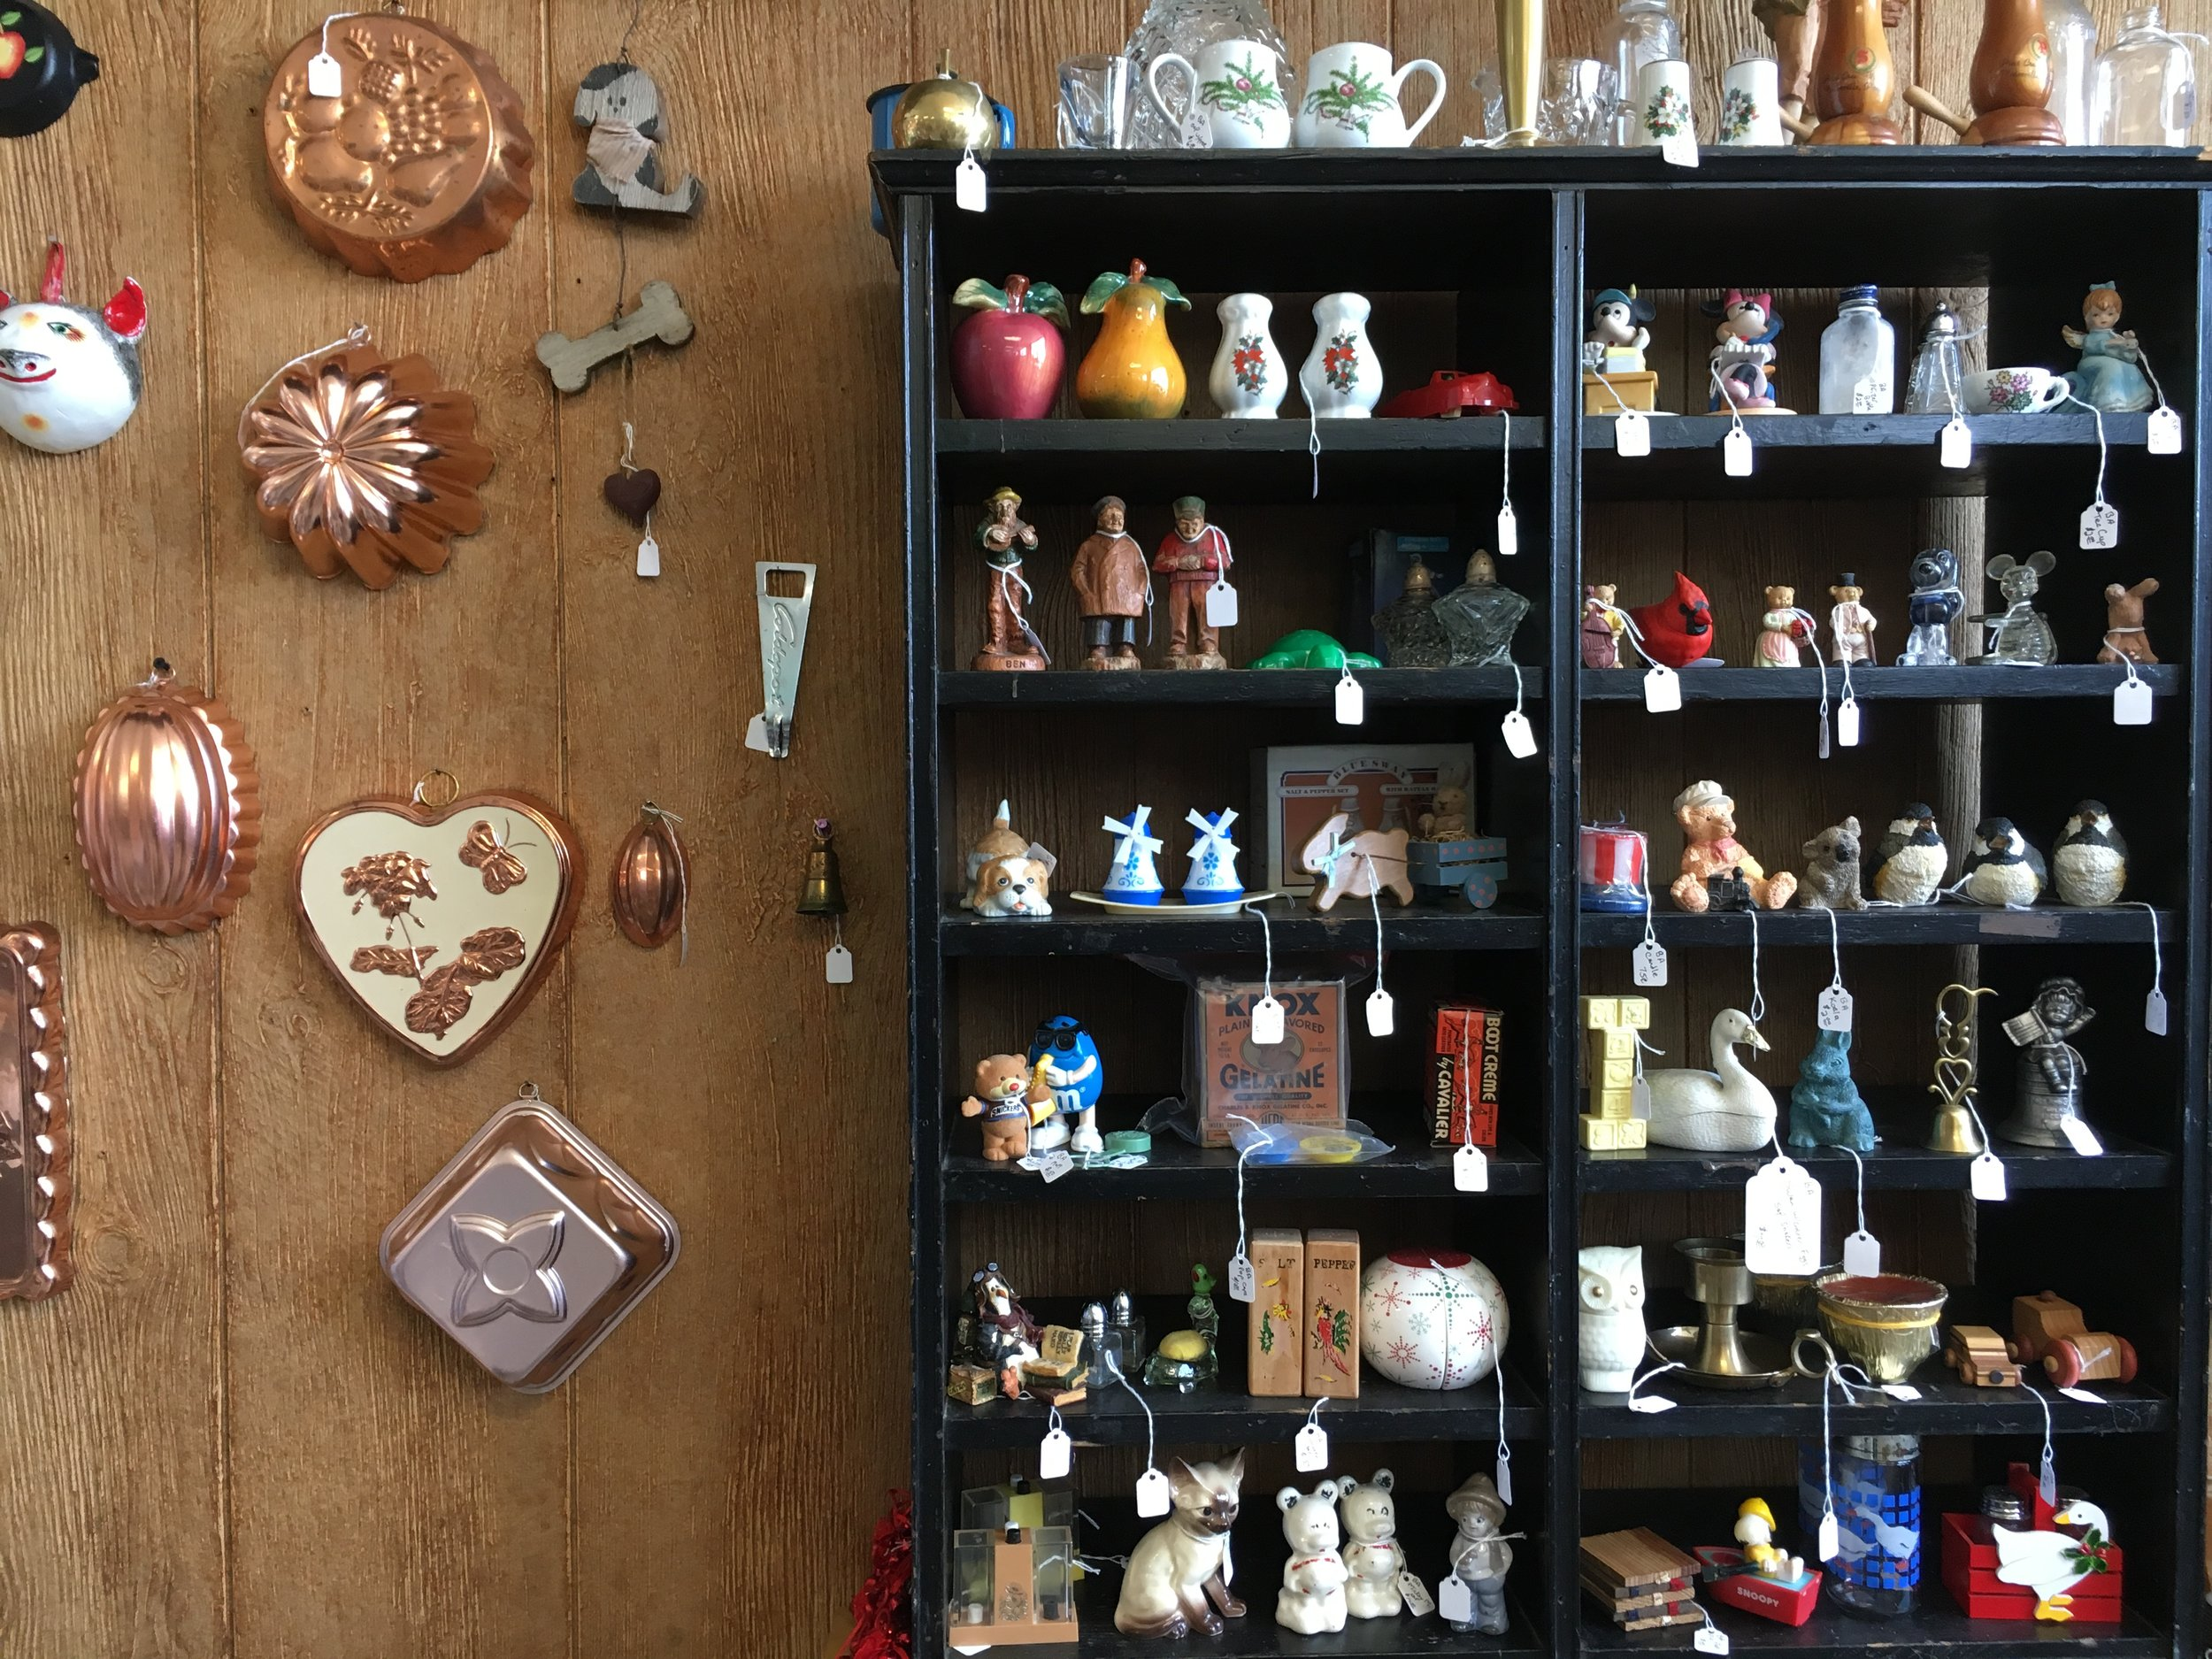 Bridgette's Attic - Vintage smalls and collectibles